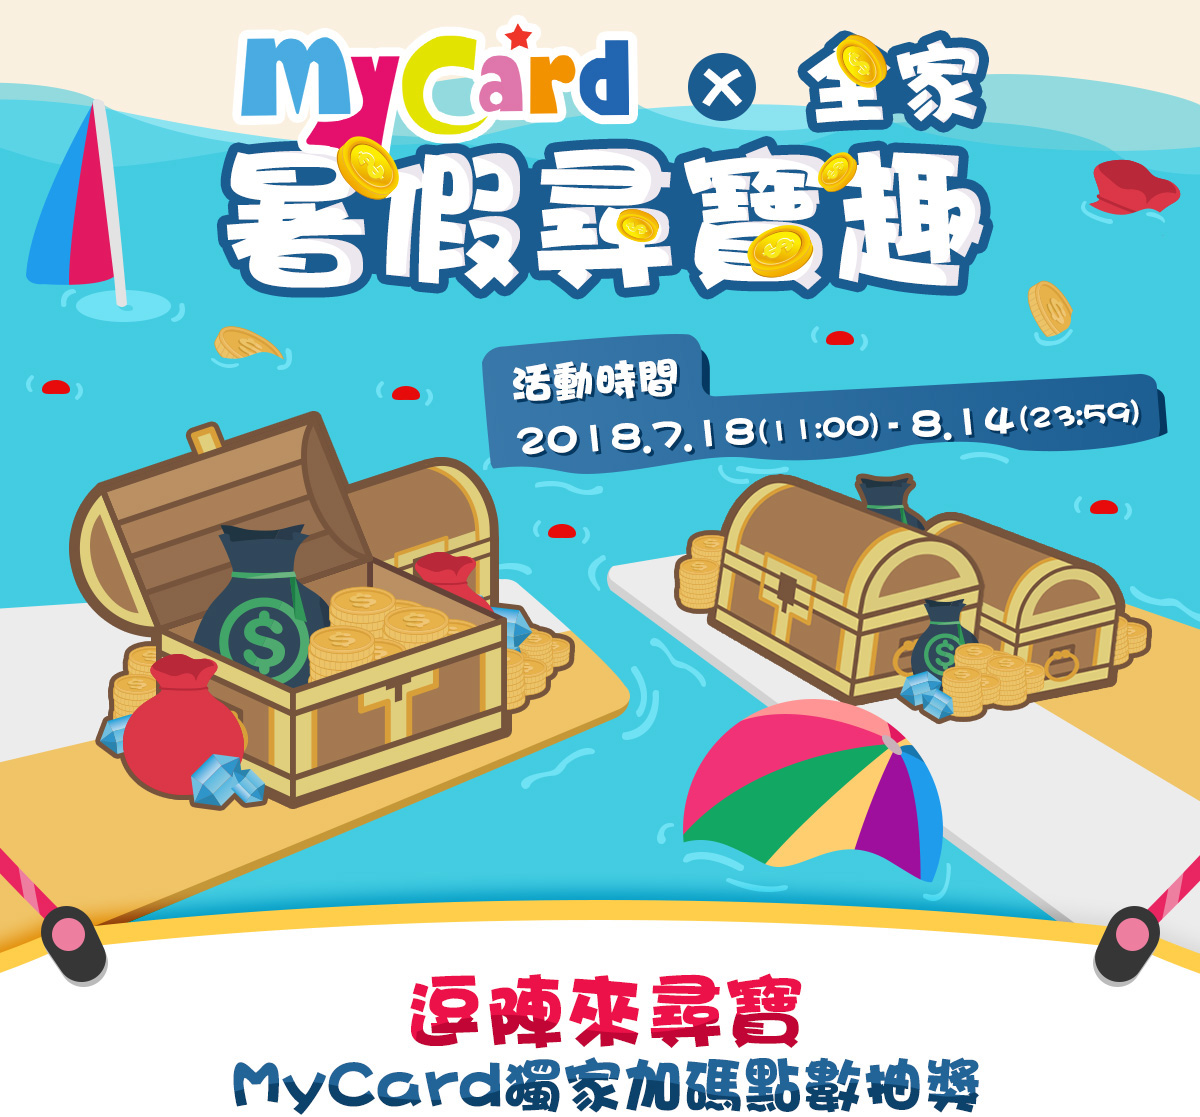 MyCard X 全家 暑假尋寶趣